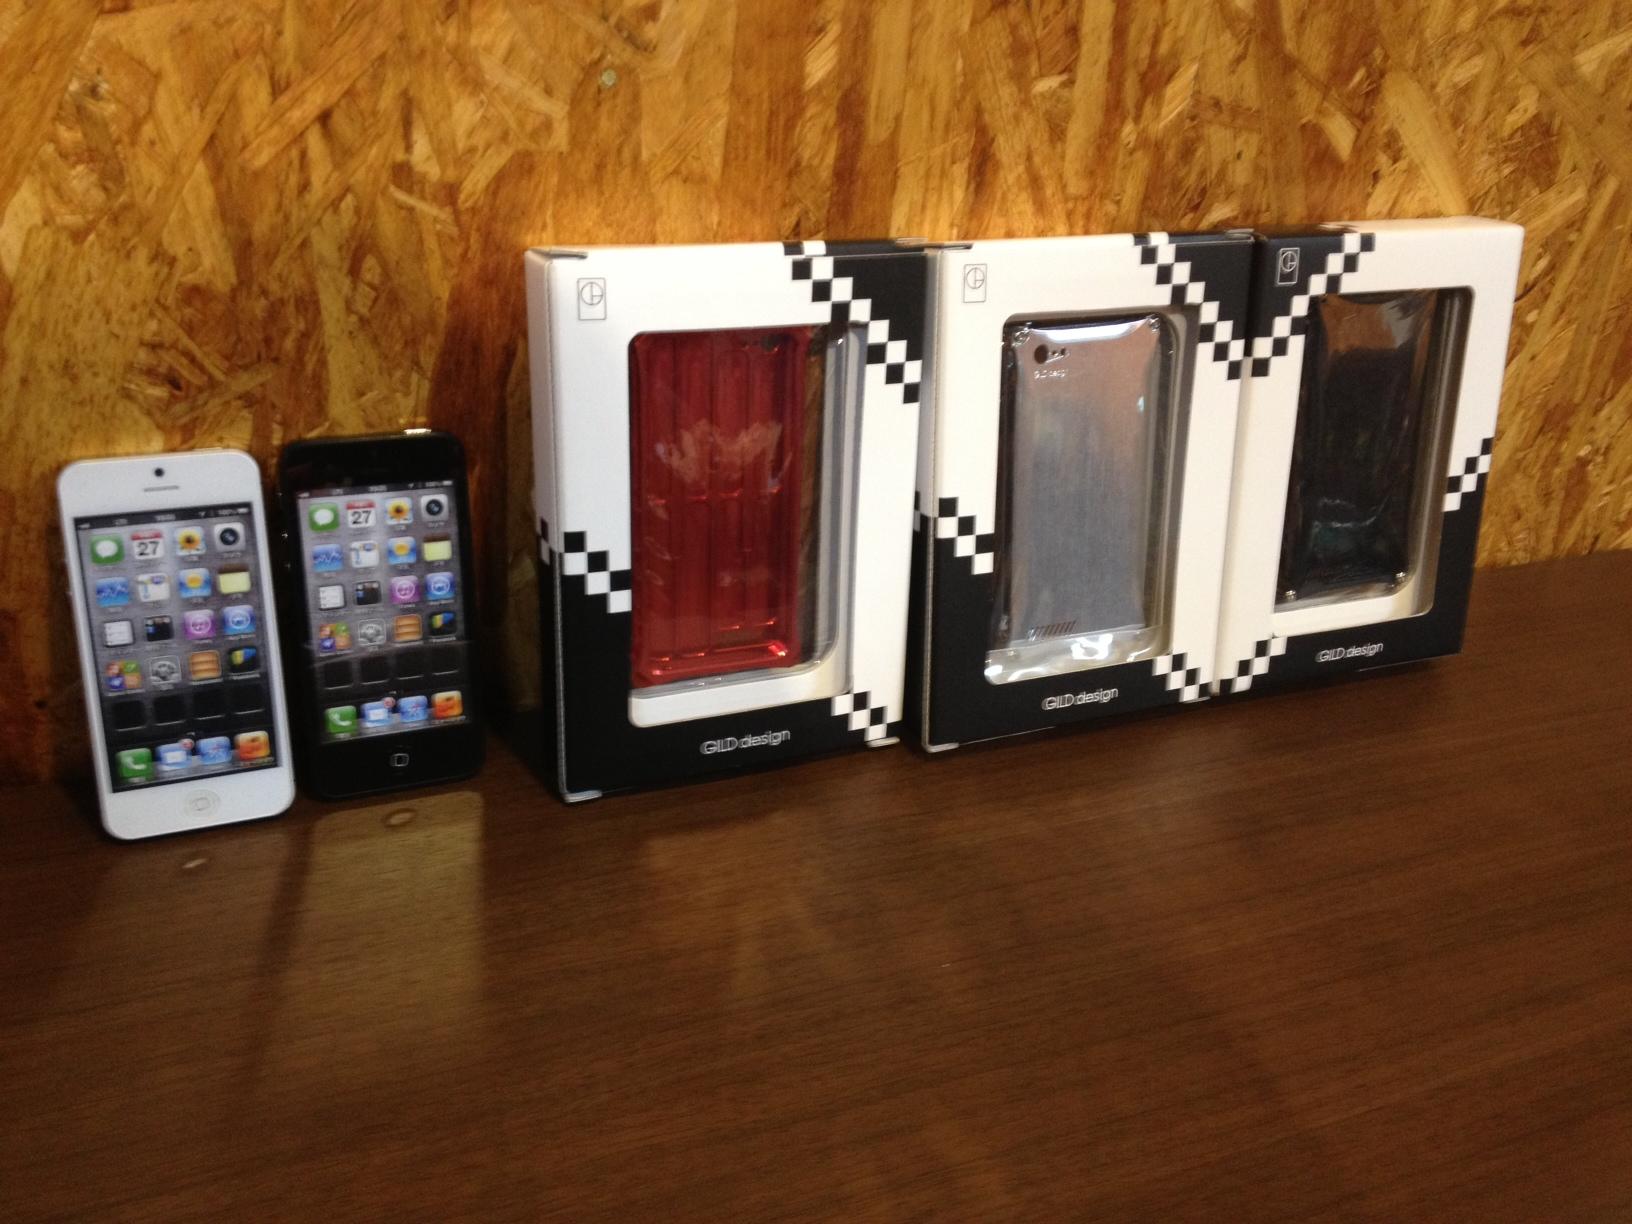 Brand GILD desgin       Solid i Phone 5Price 8,920